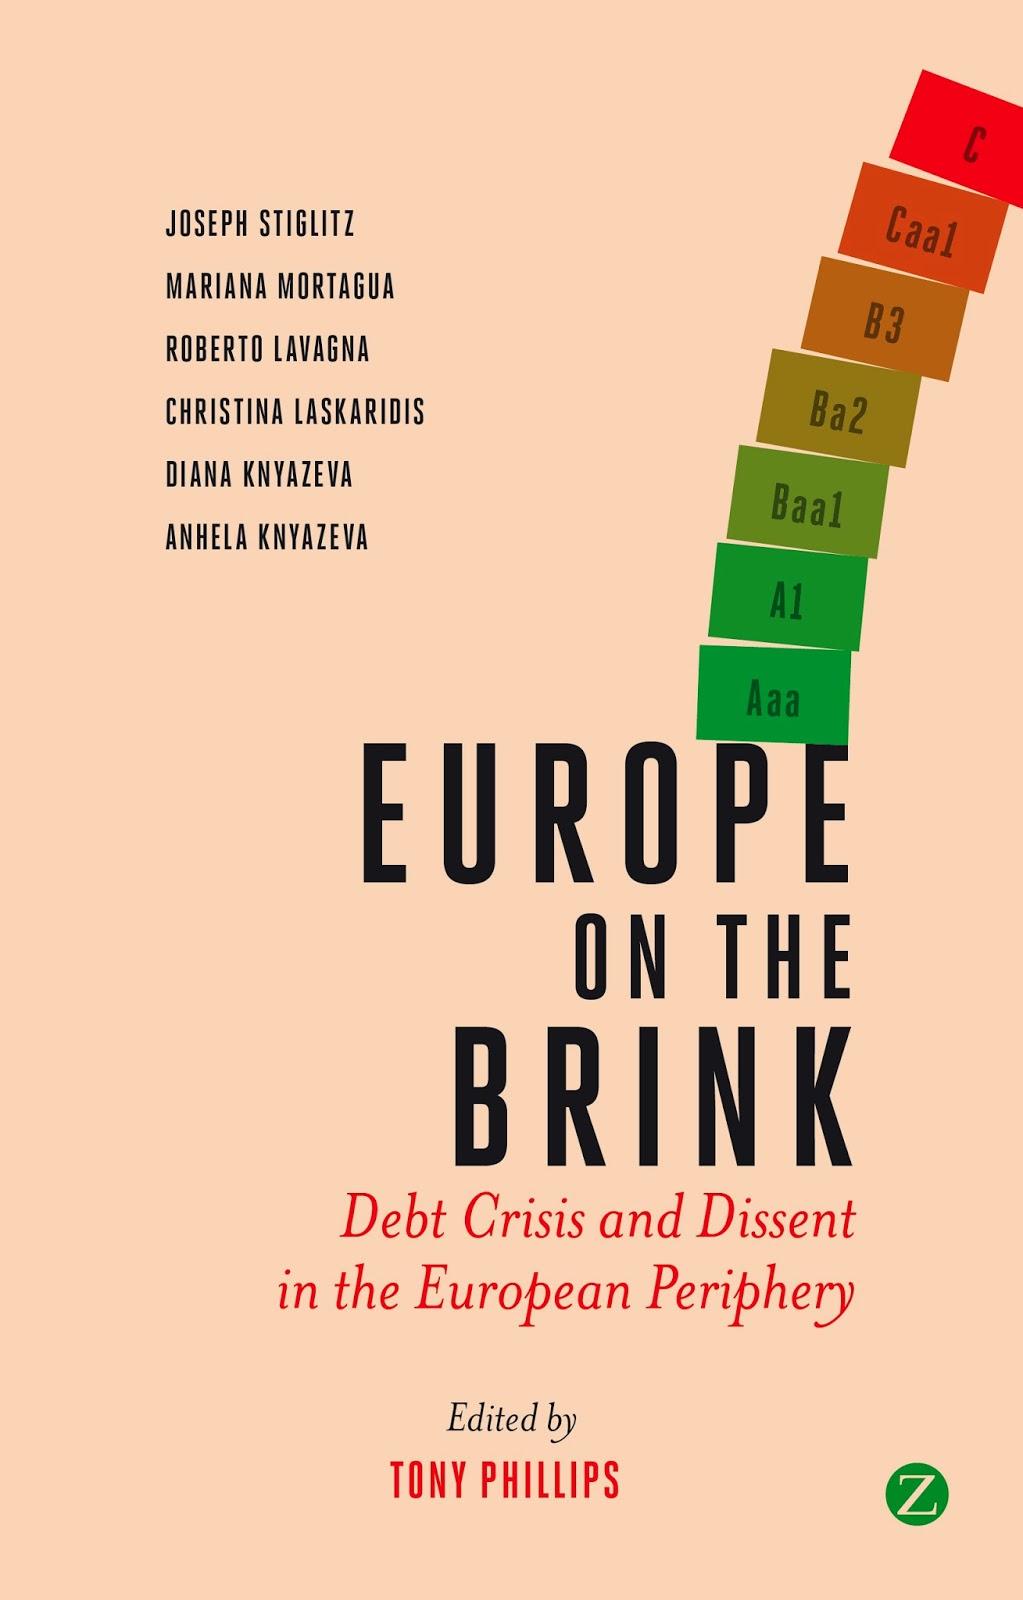 Causes of the European debt crisis